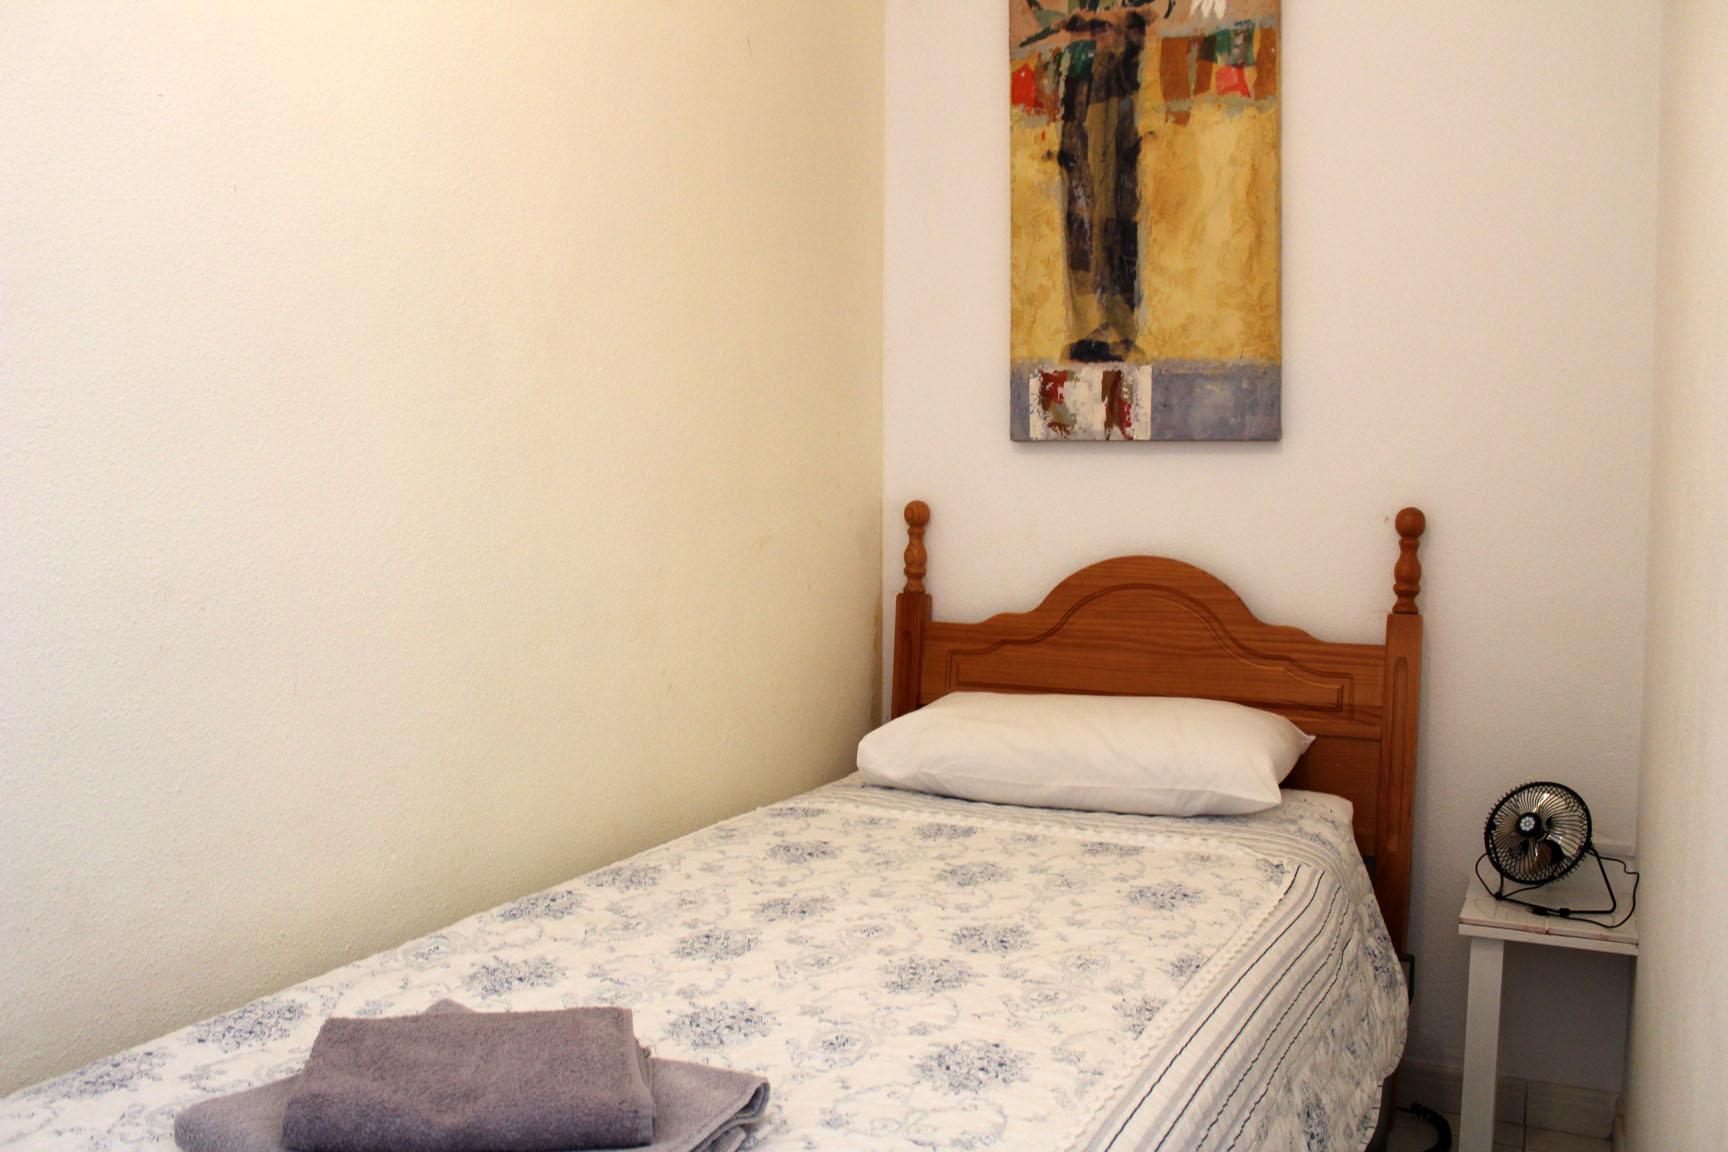 ITSH Property Single bedroom 9